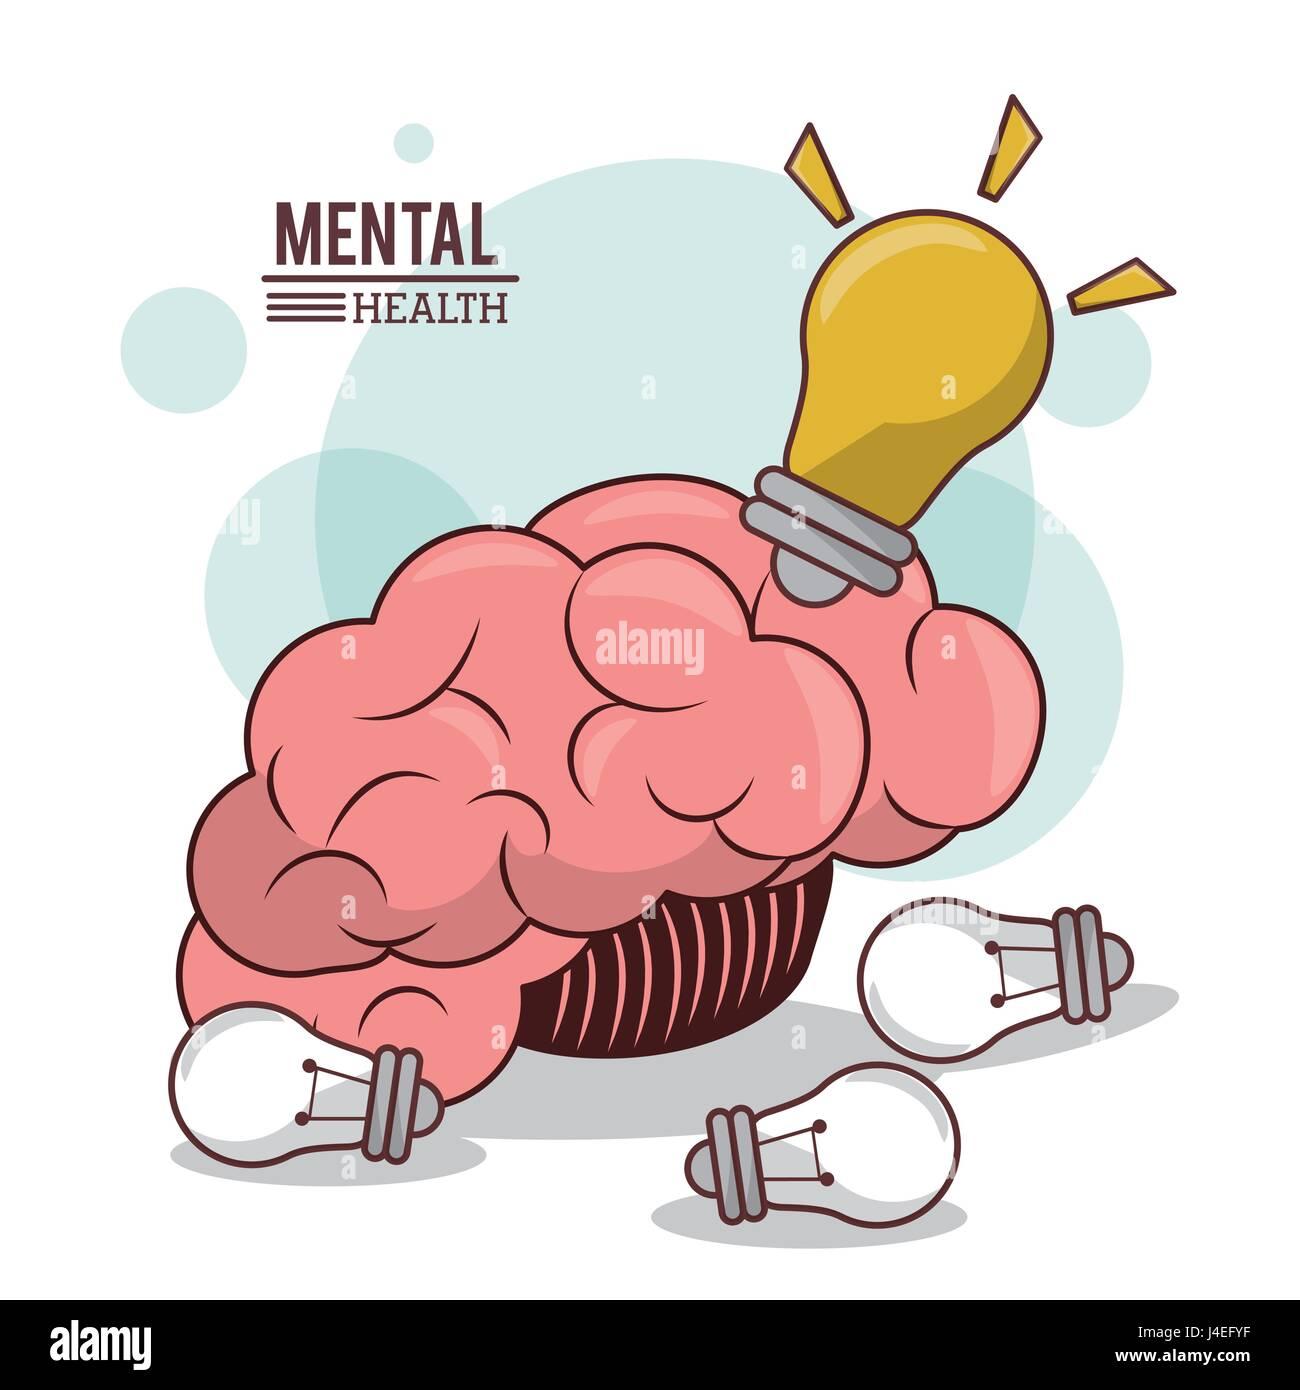 mental health, human brain bulb idea innovation mind - Stock Image